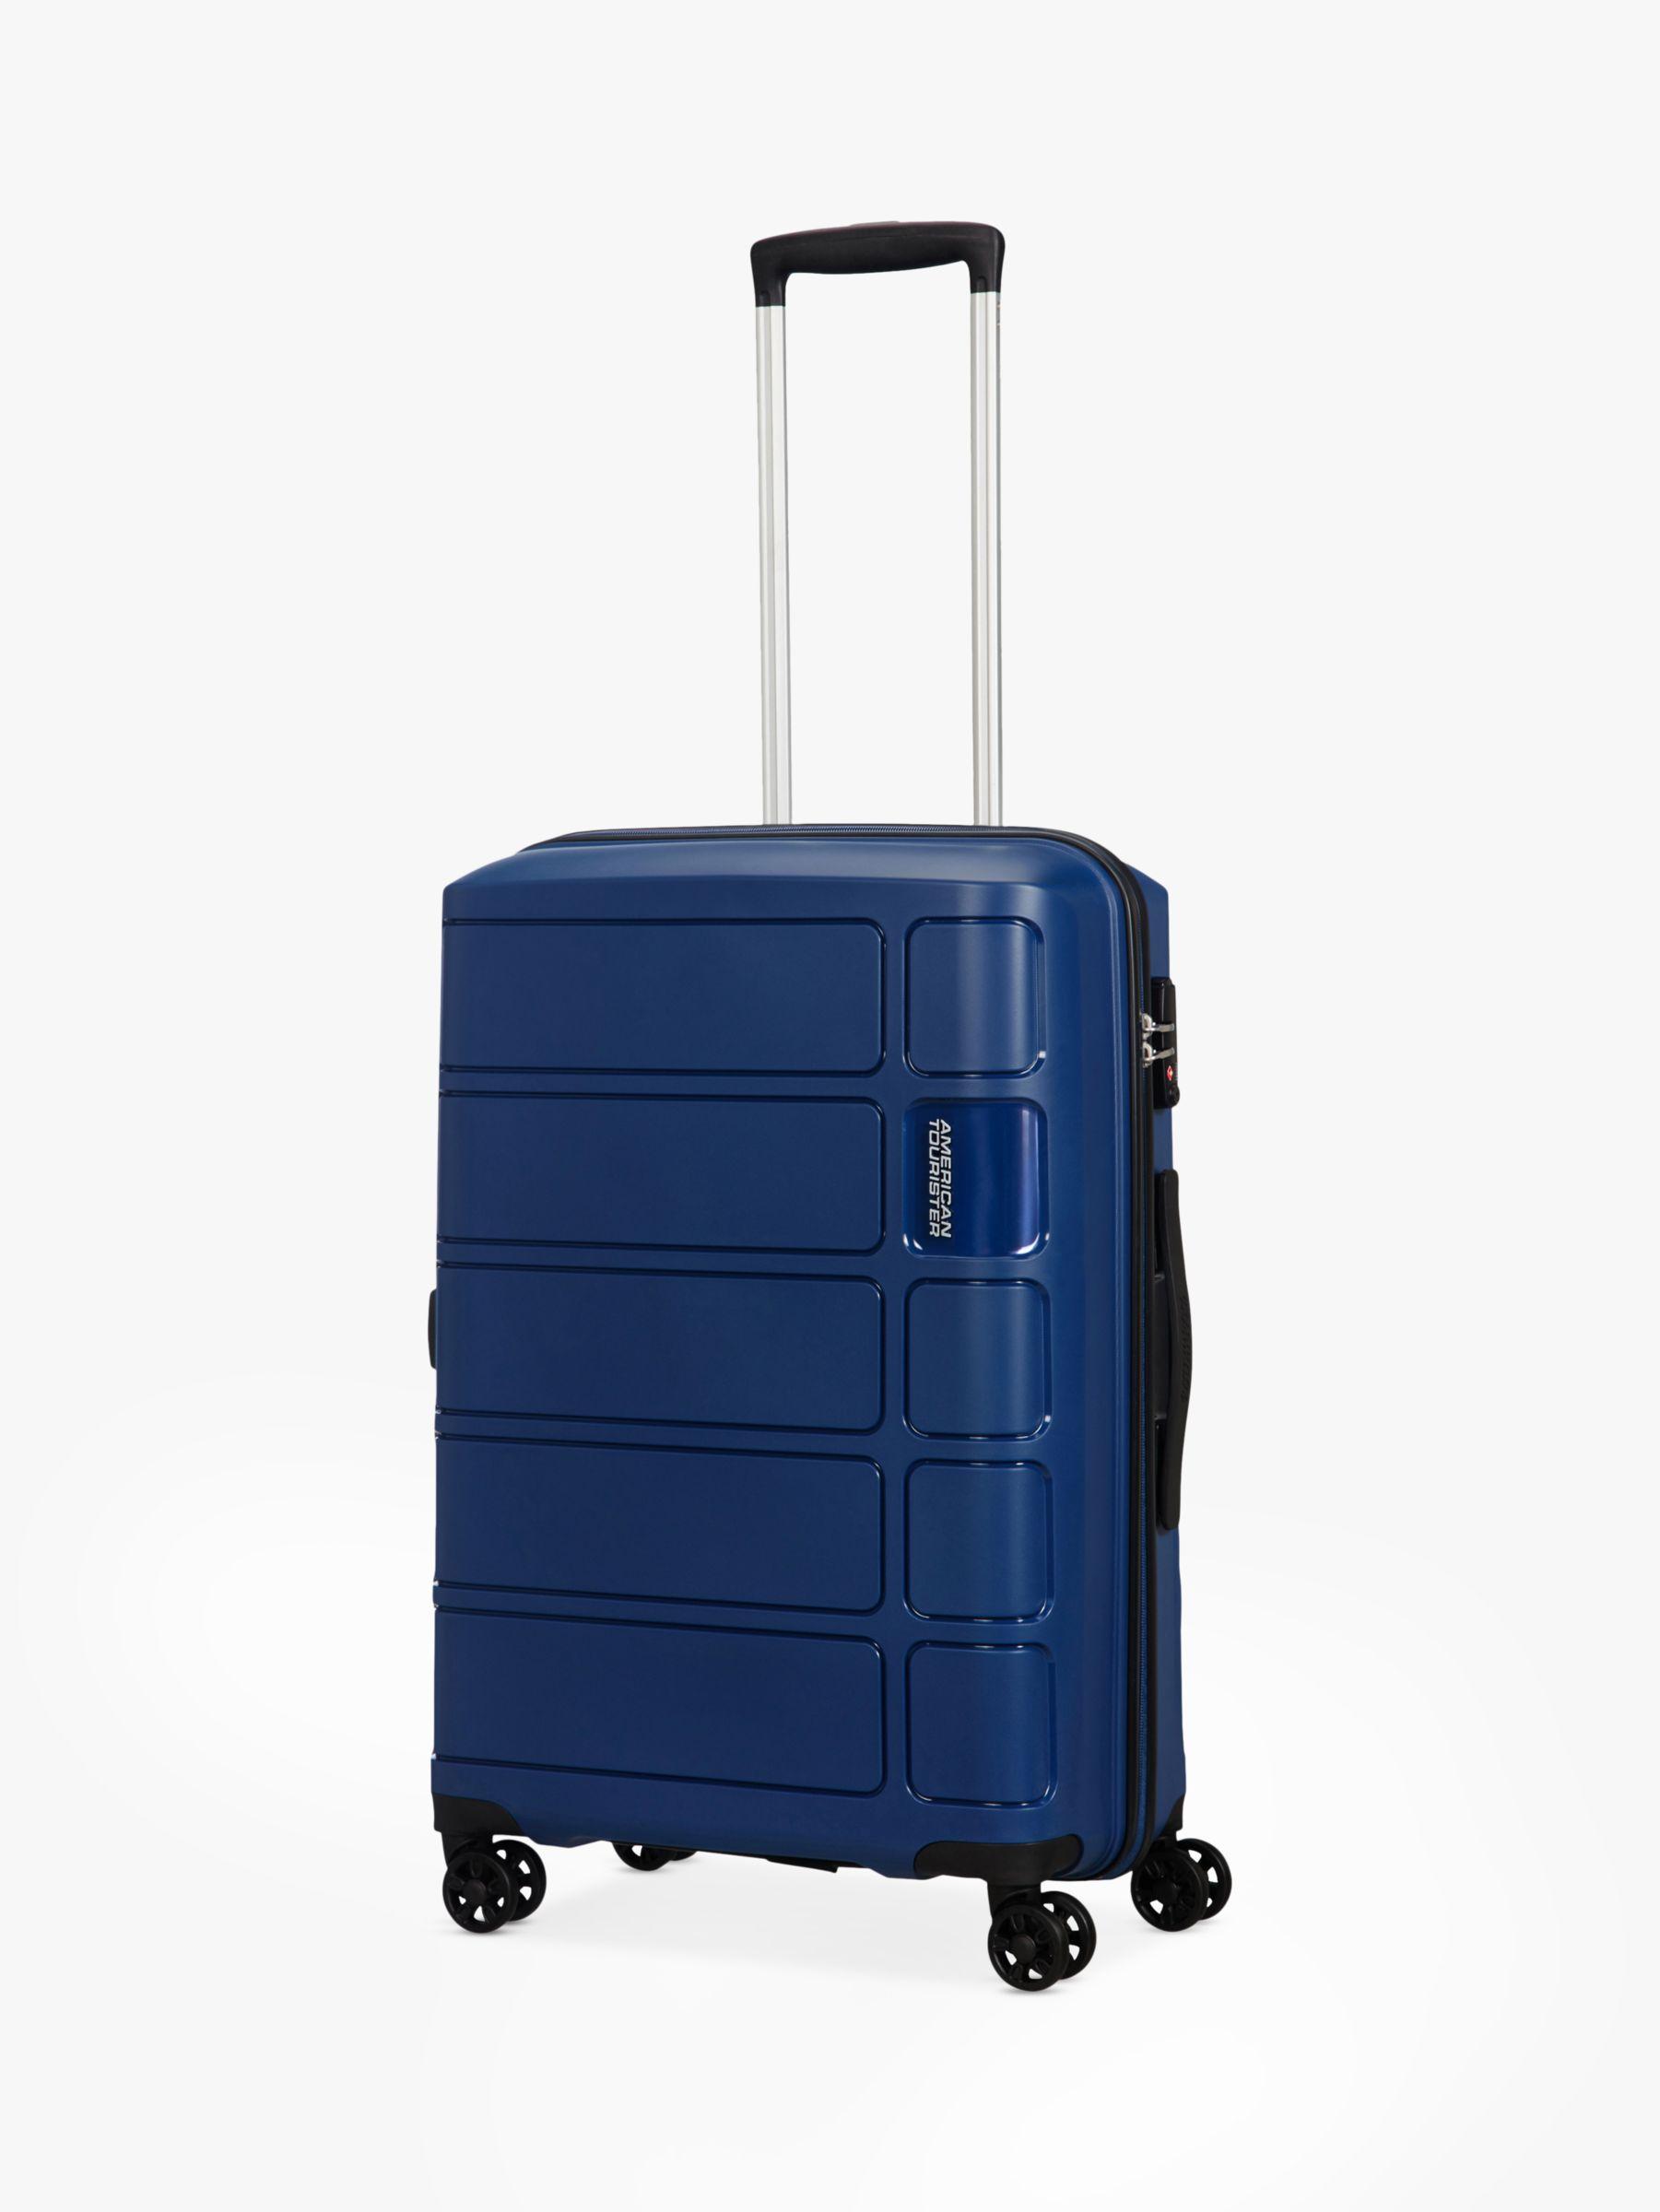 American Tourister American Tourister Summer Splash 4-Wheel 55cm Cabin Case